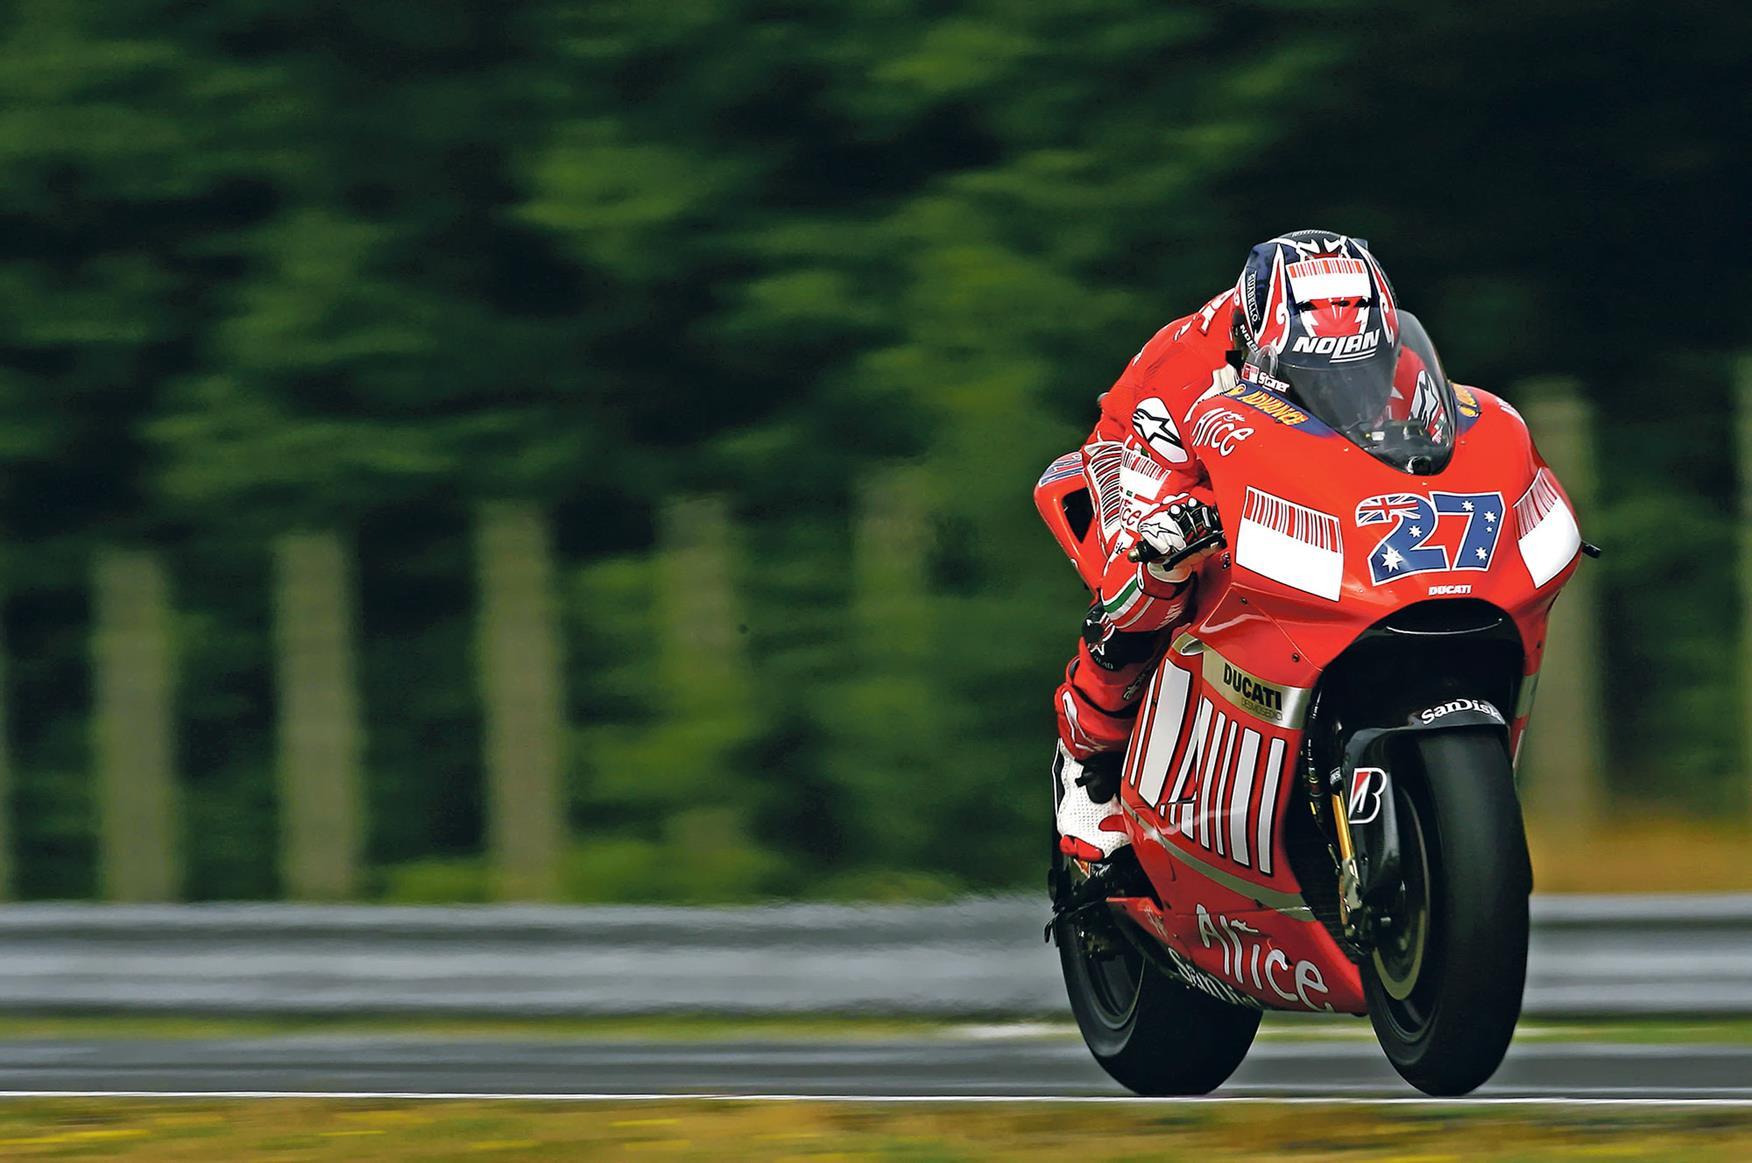 Casey Stoner 2007 MotoGP champion